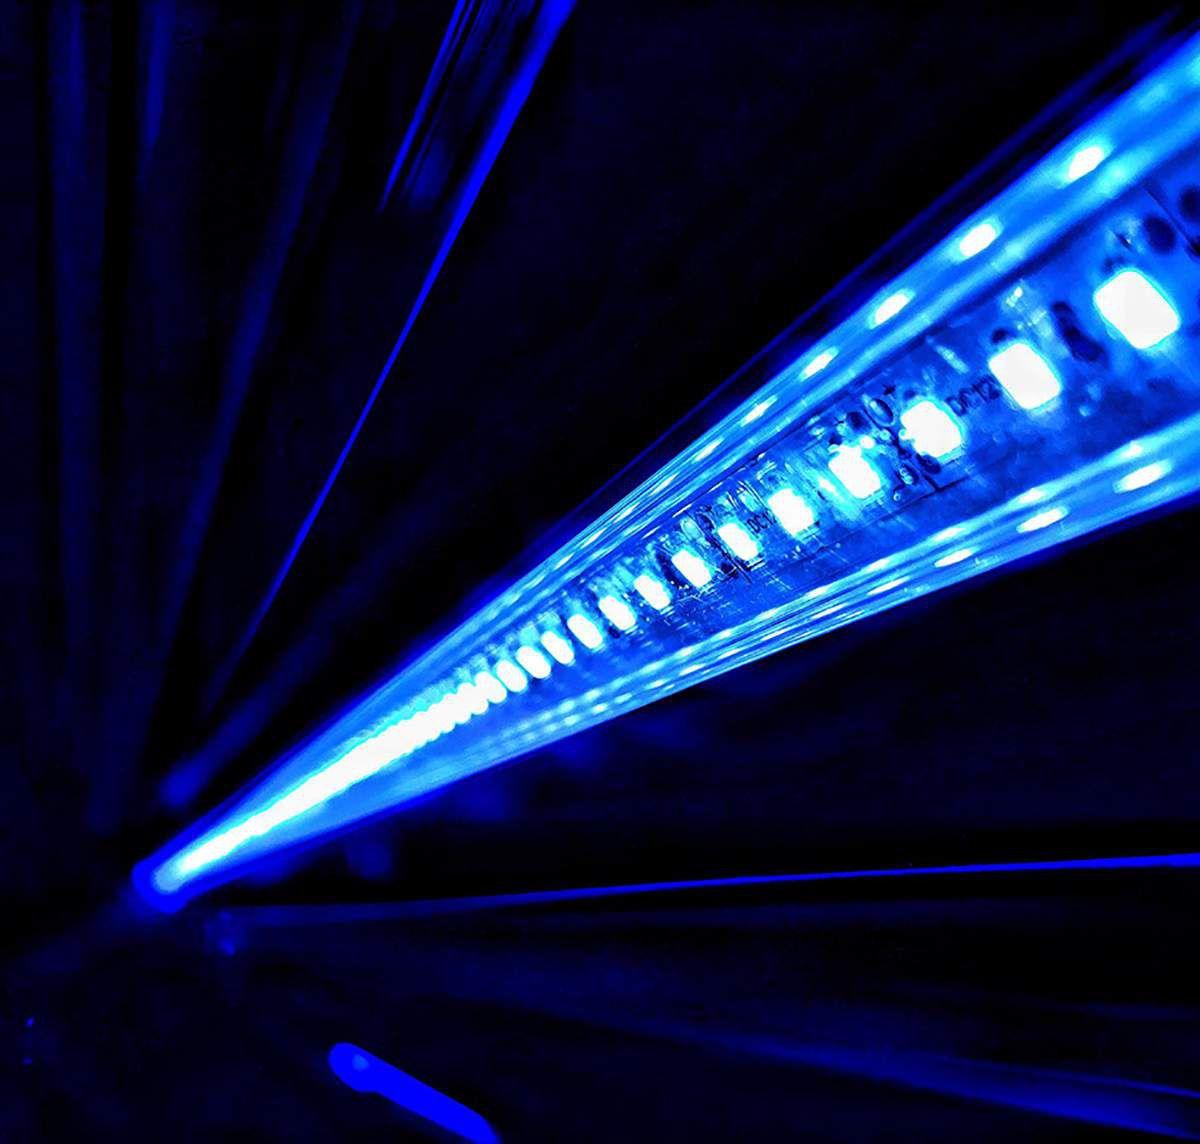 Luminária Althea Pacific Sun Híbrida T5 4x24W+2x LED 36x60cm